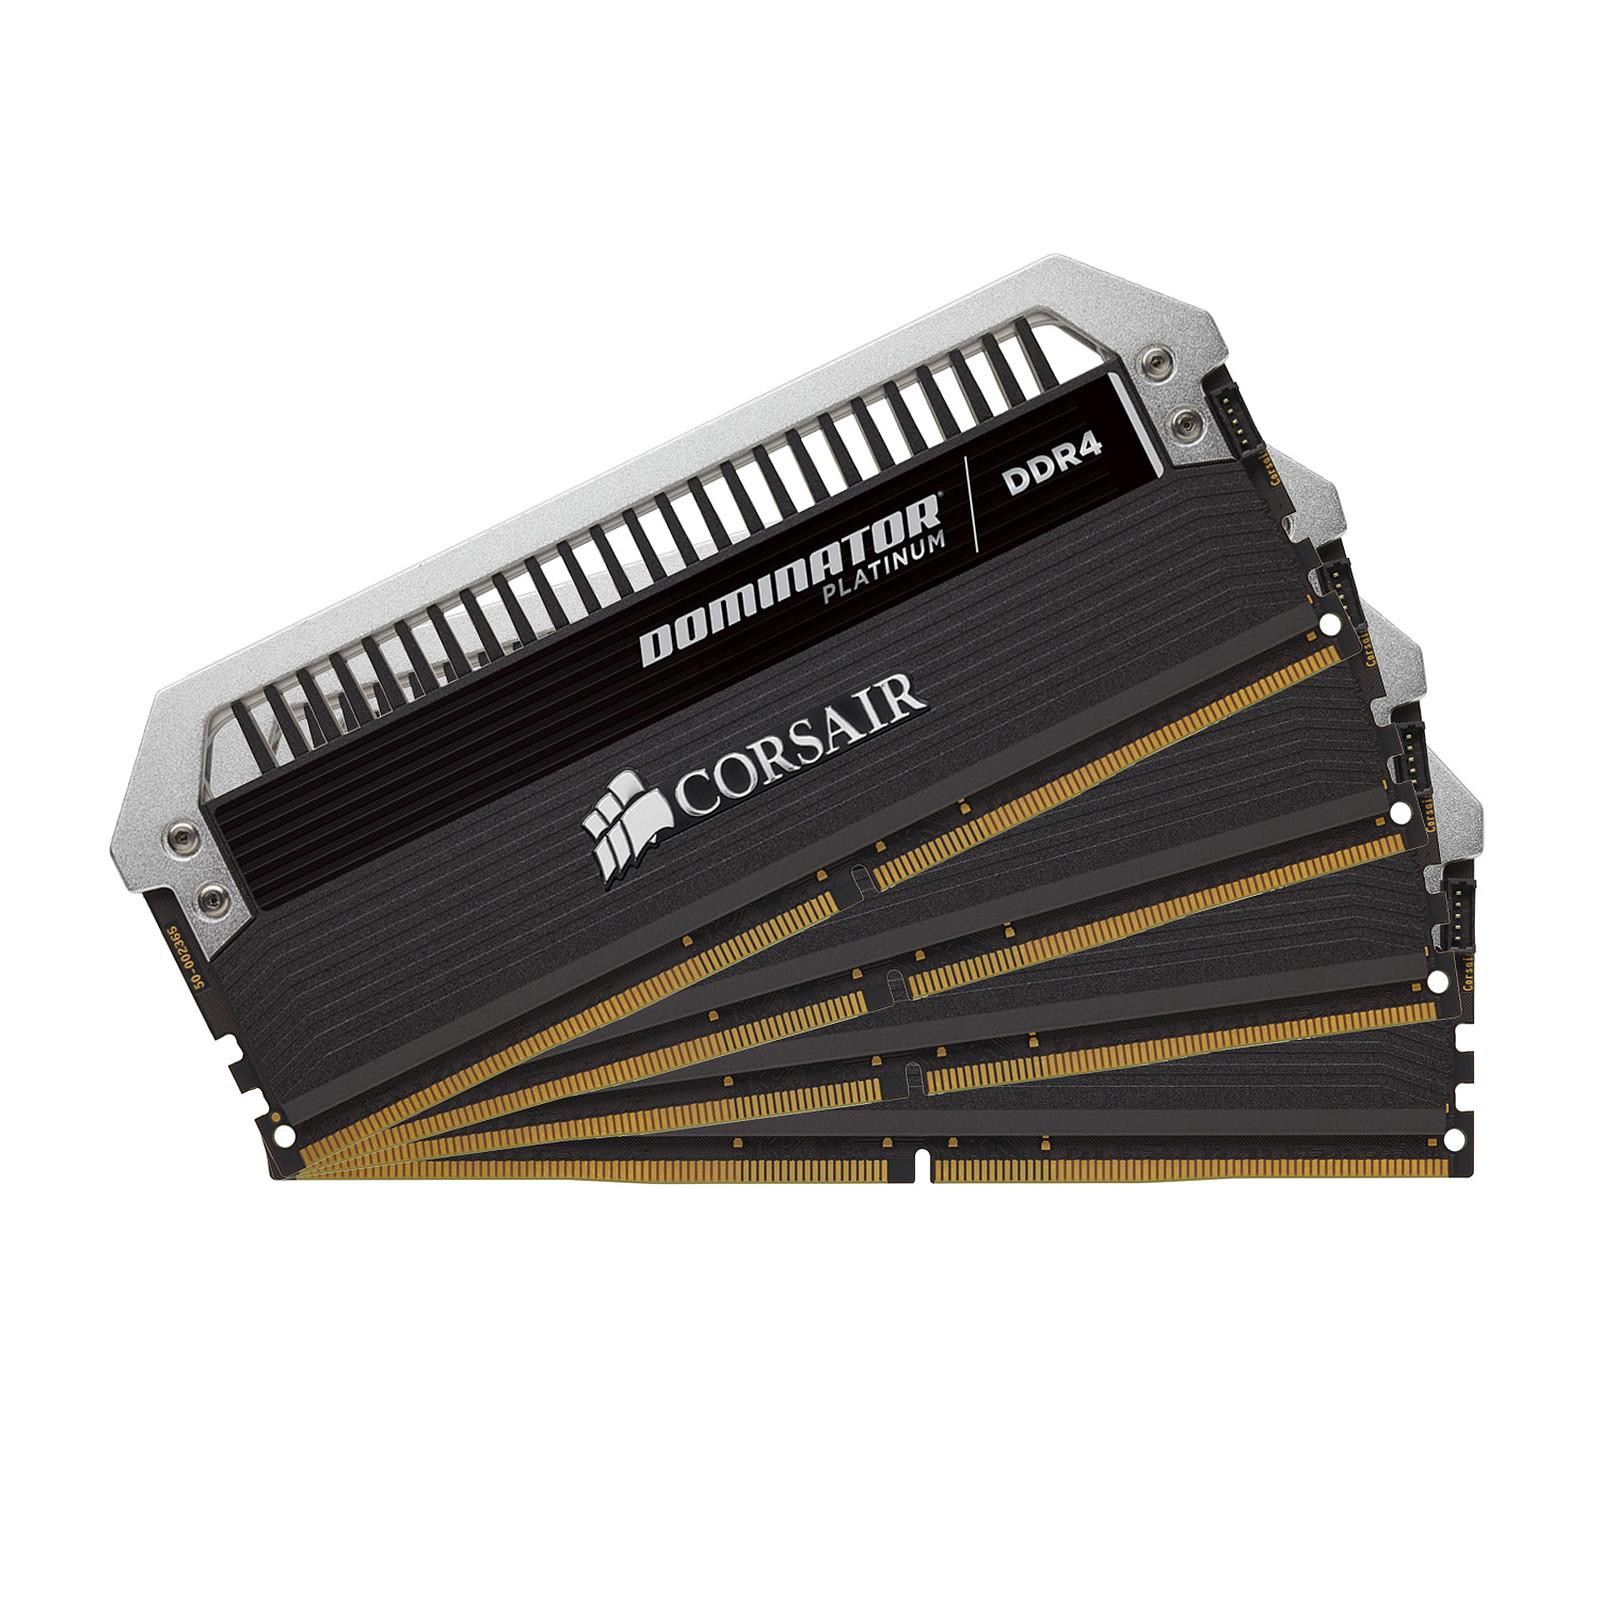 Corsair Dominator Platinum 32 Go (4x 8 Go) DDR4 3600 MHz CL16